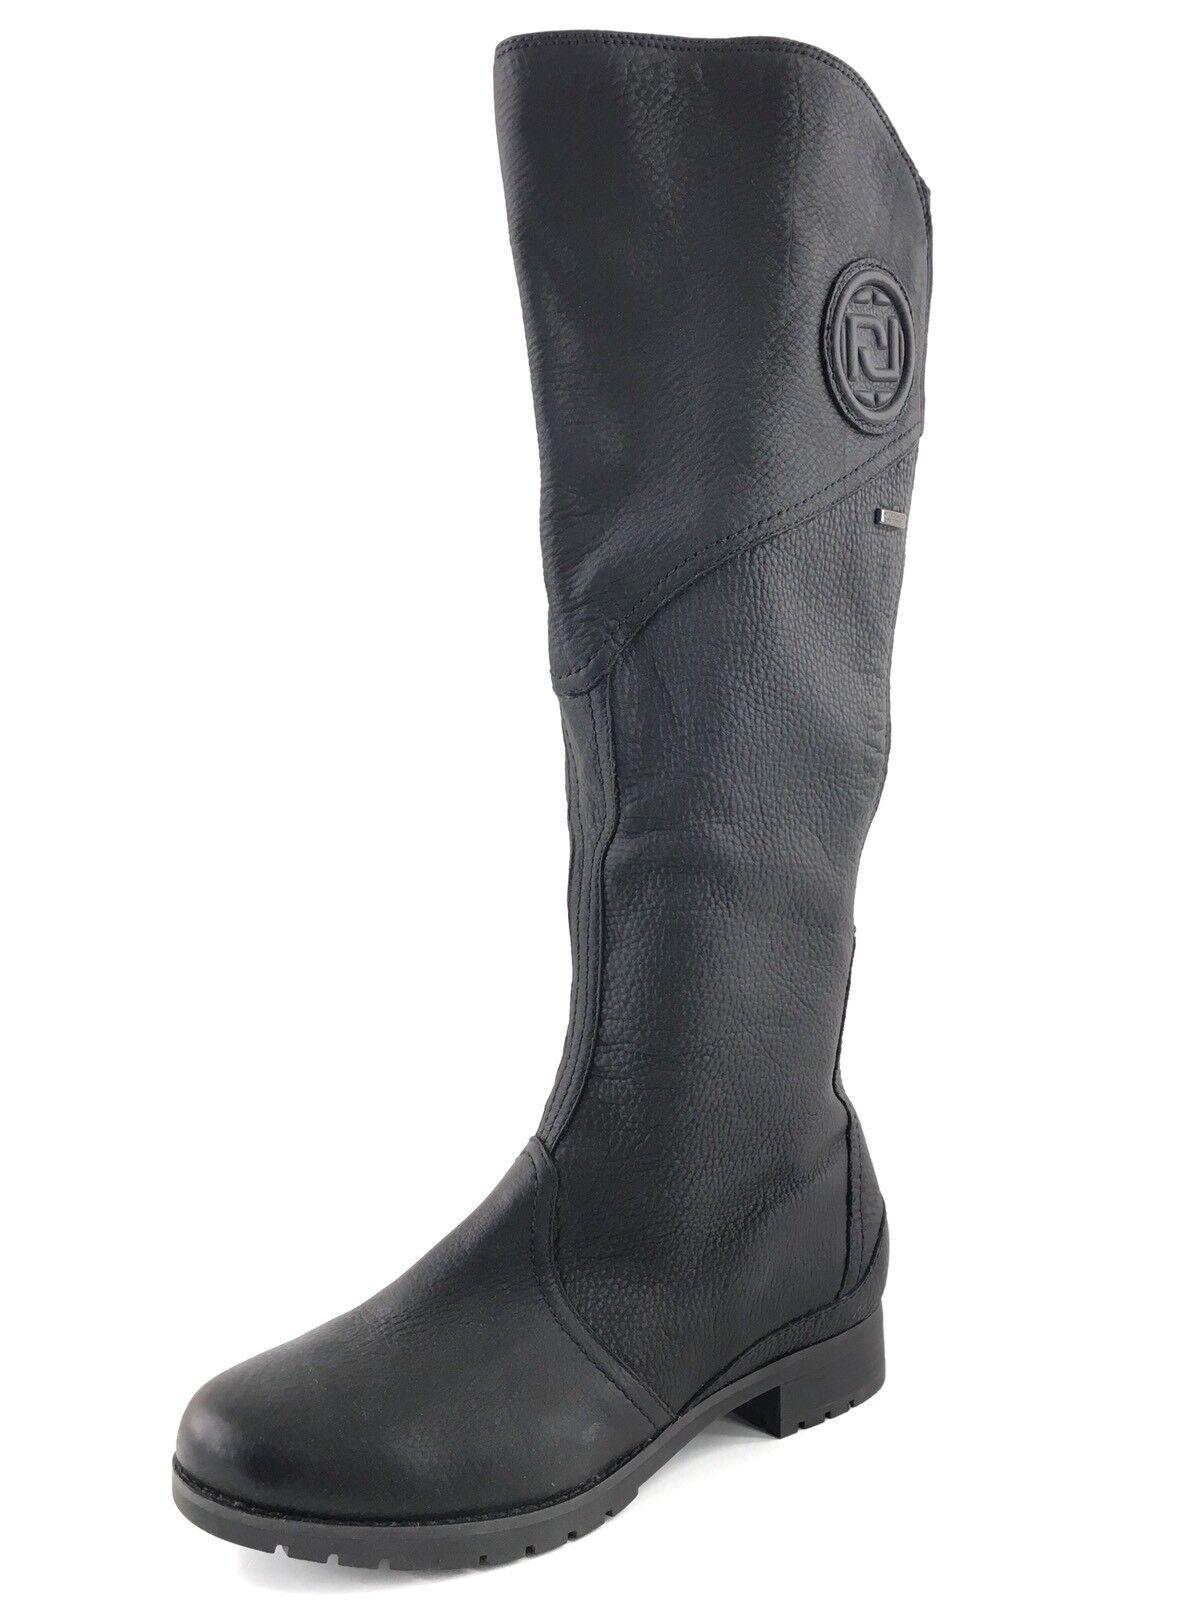 Nuevo Rockport Tristina Gore Cuero Negro botas Hasta La La La Rodilla amplia para mujer Talla 6 M   perfecto